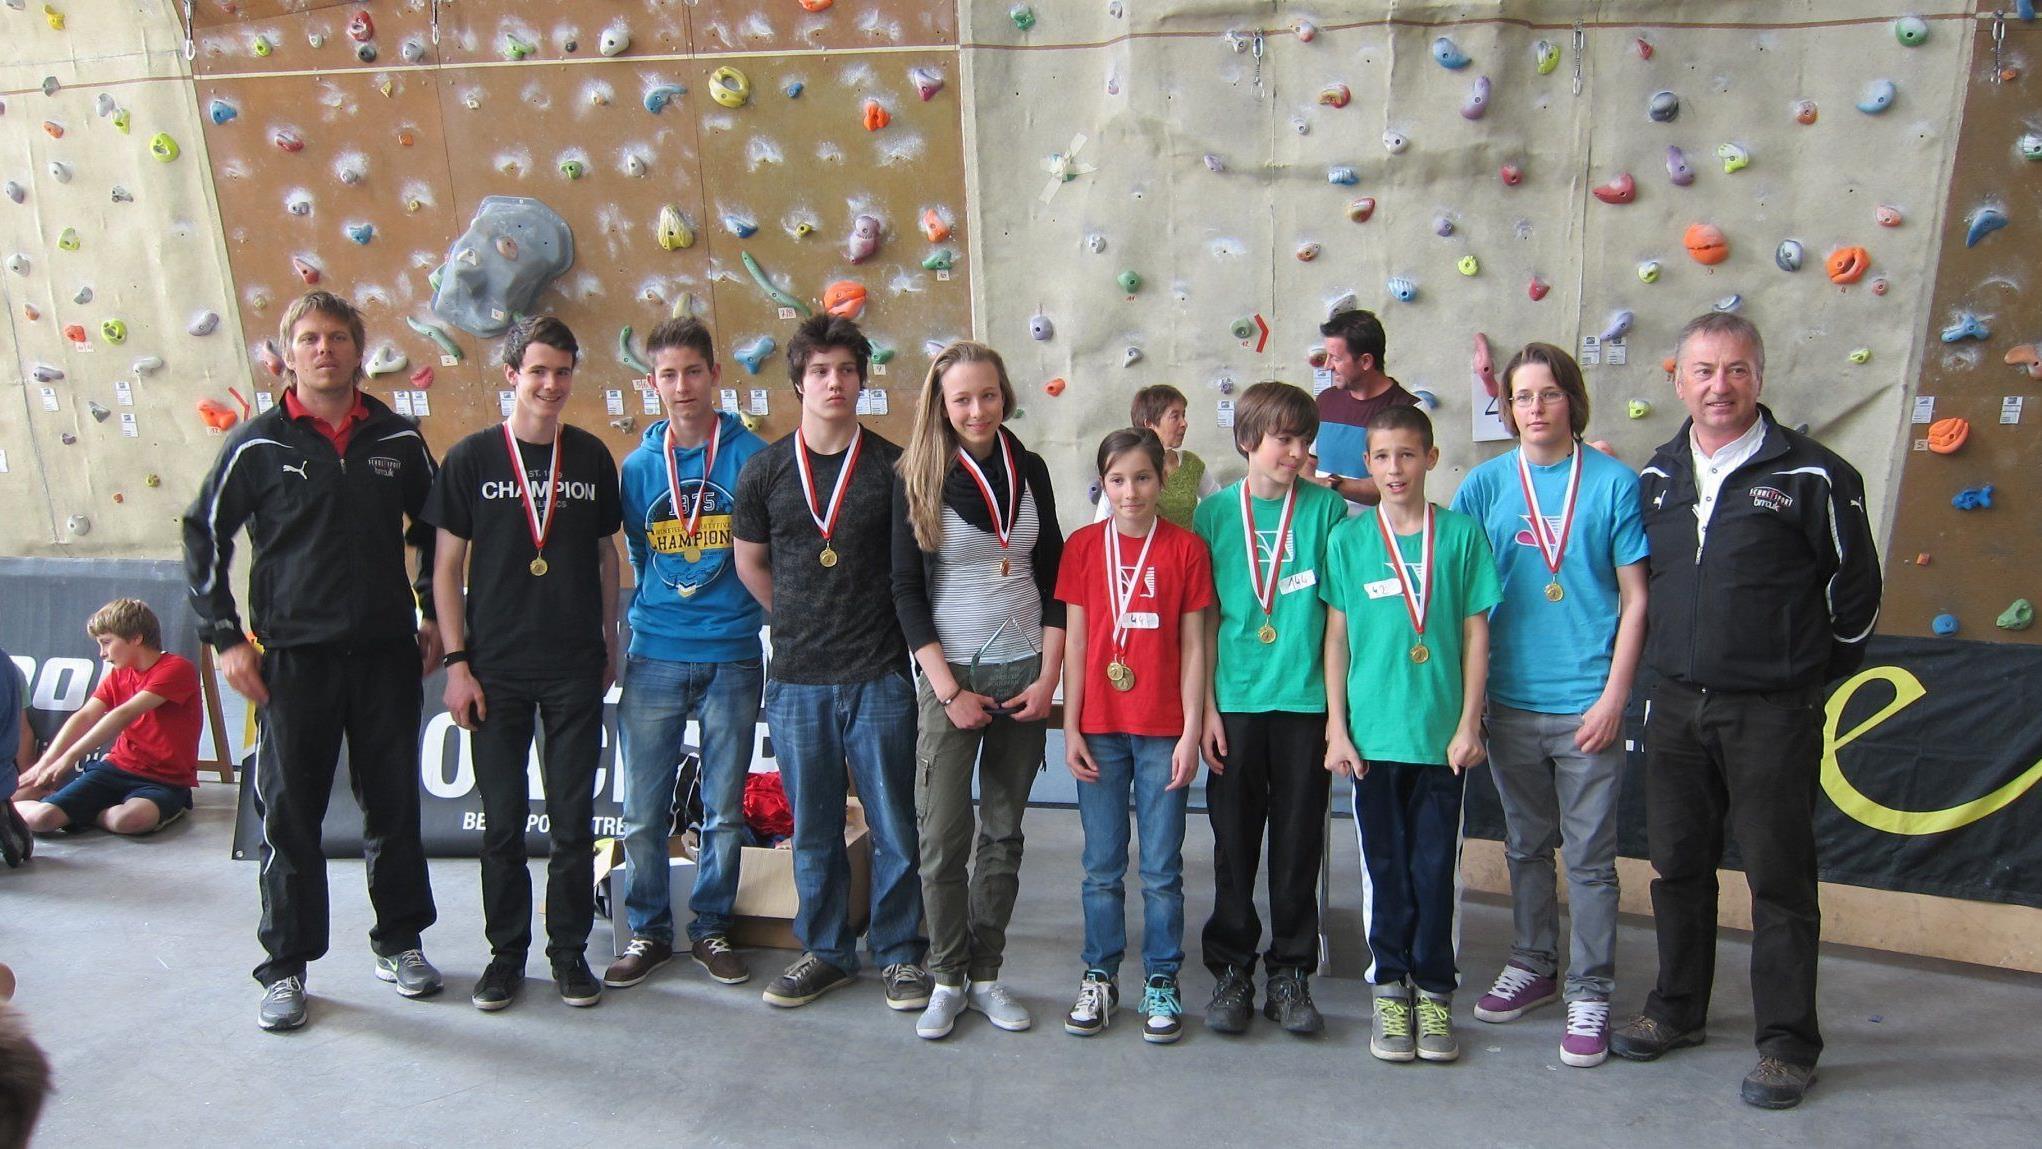 Klettersteigset Gigasport : Schulbouldercup dornbirn vol.at